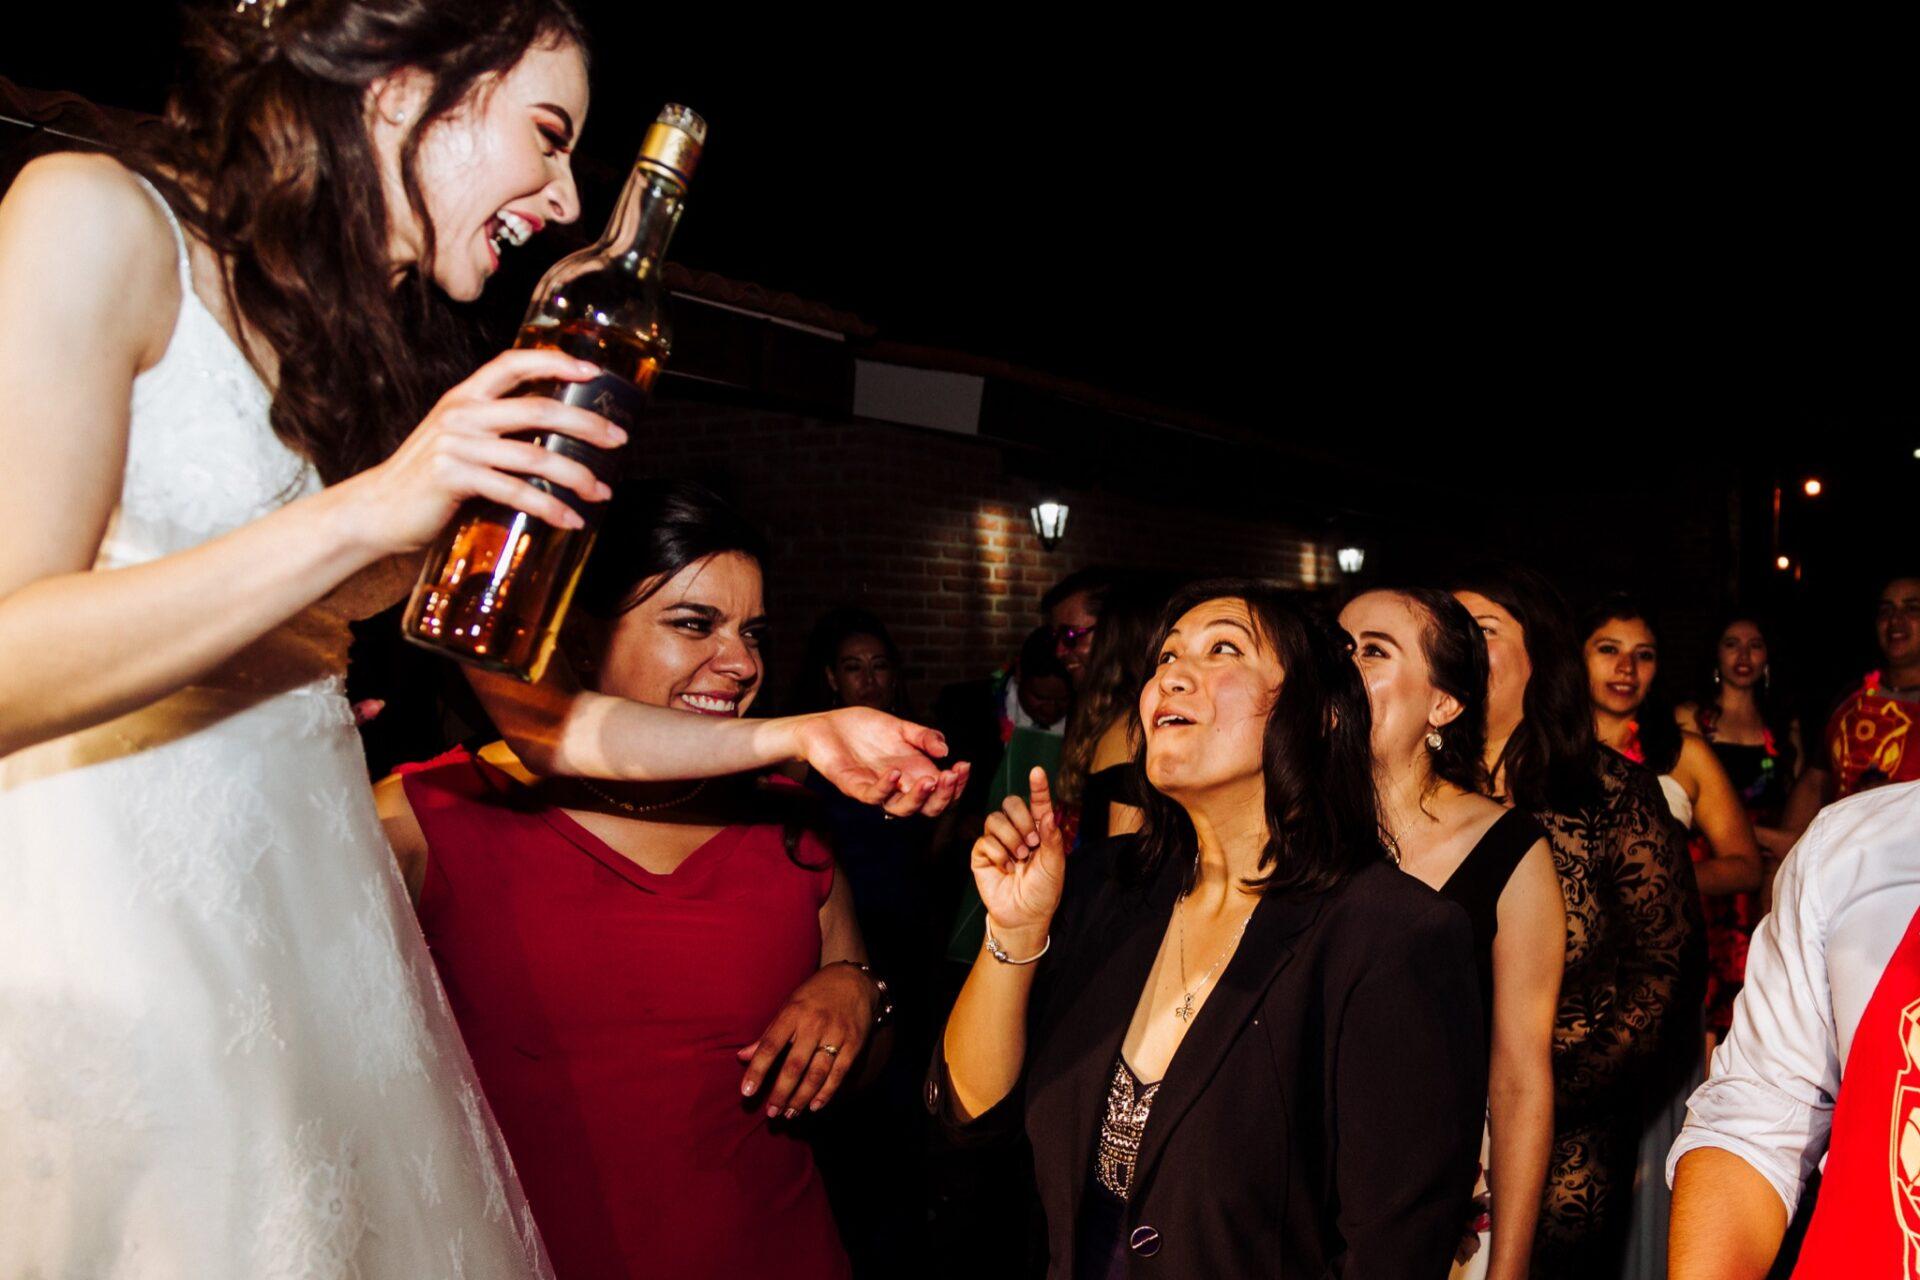 javier_noriega_fotografo_bodas_teul_zacatecas_wedding_photographer48